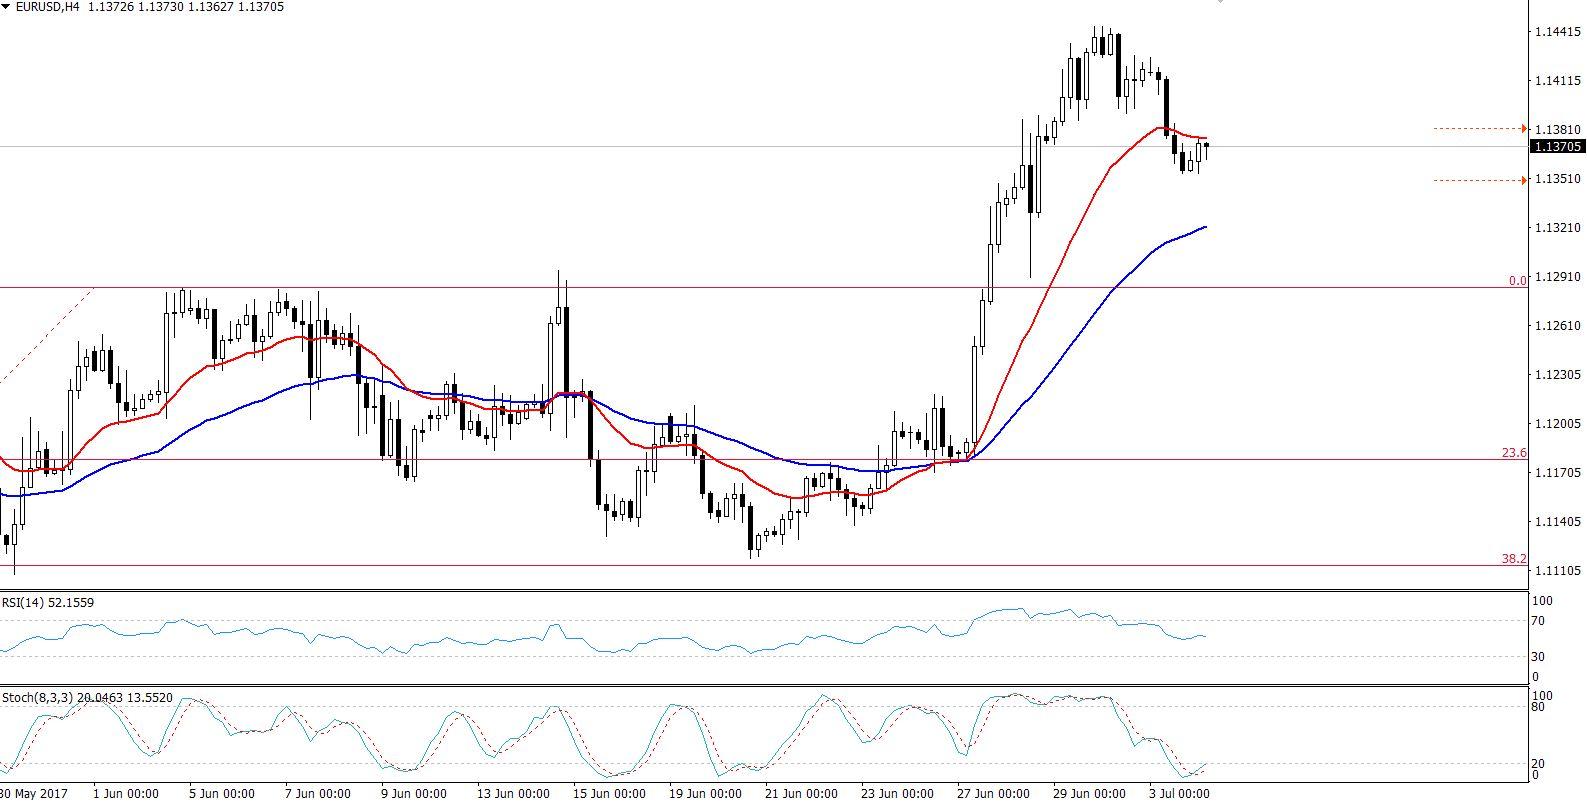 EURUSD - 4 Hours Chart - 38.2% Retracement